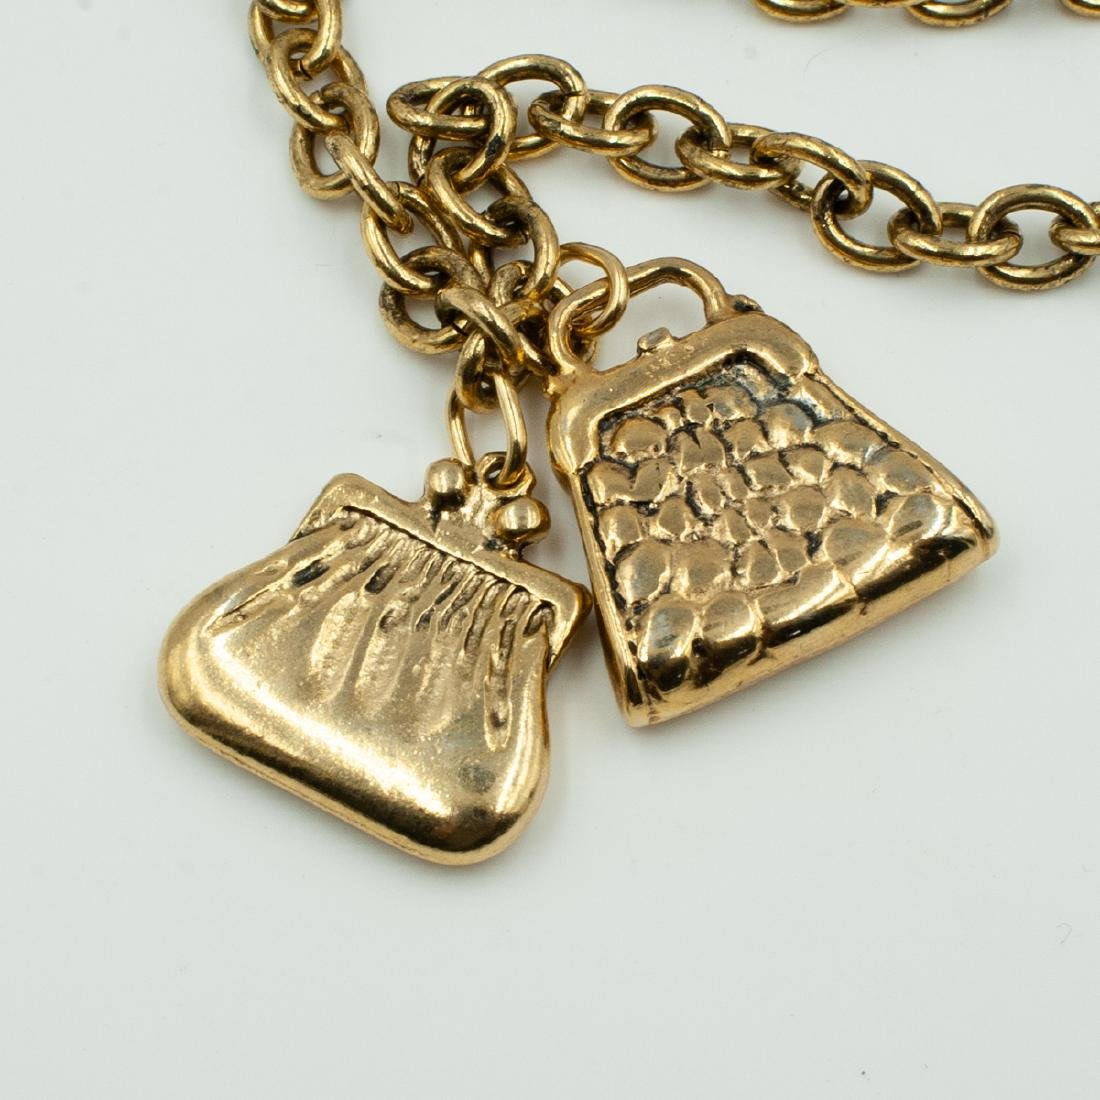 Costume Jewelry Purse Chain - 2